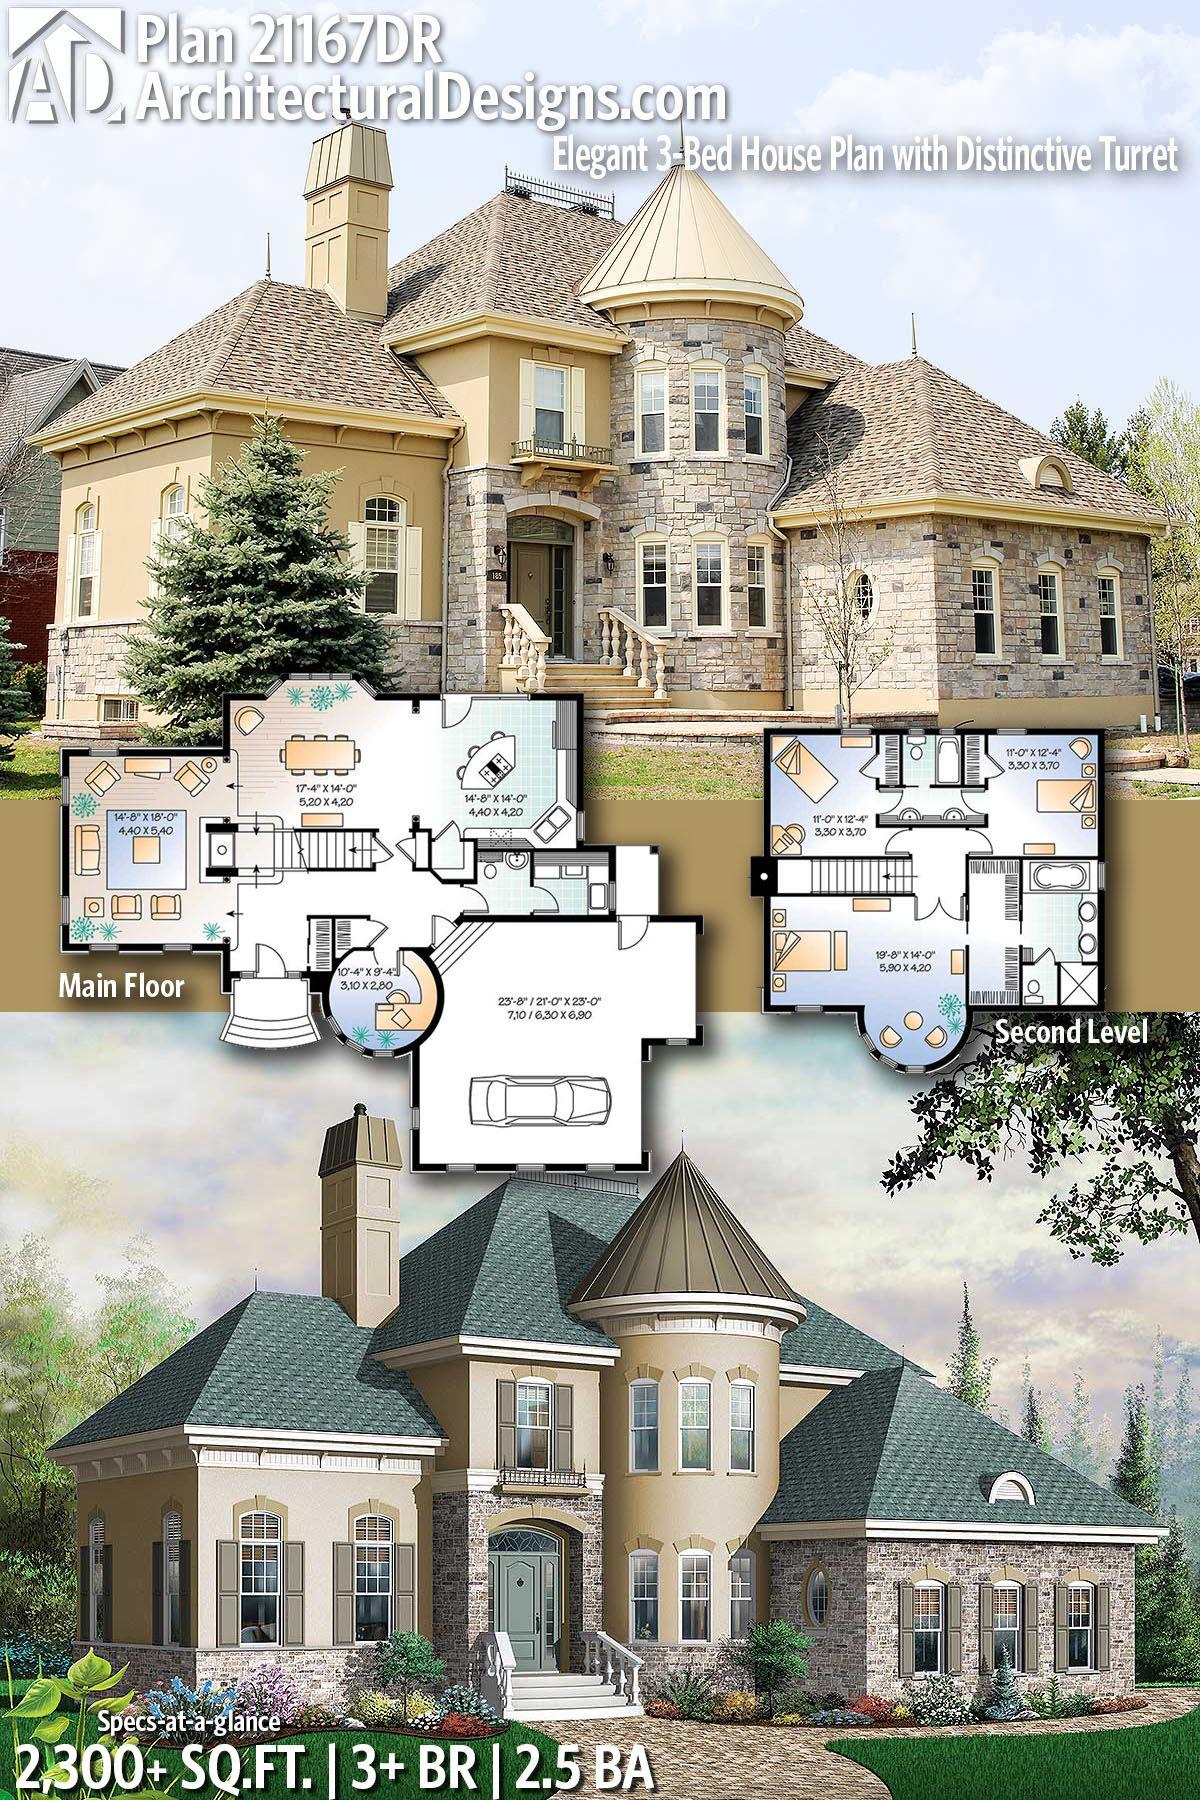 Plan 21167dr Elegant 3 Bed House Plan With Distinctive Turret House Plans Architectural Design House Plans House Blueprints